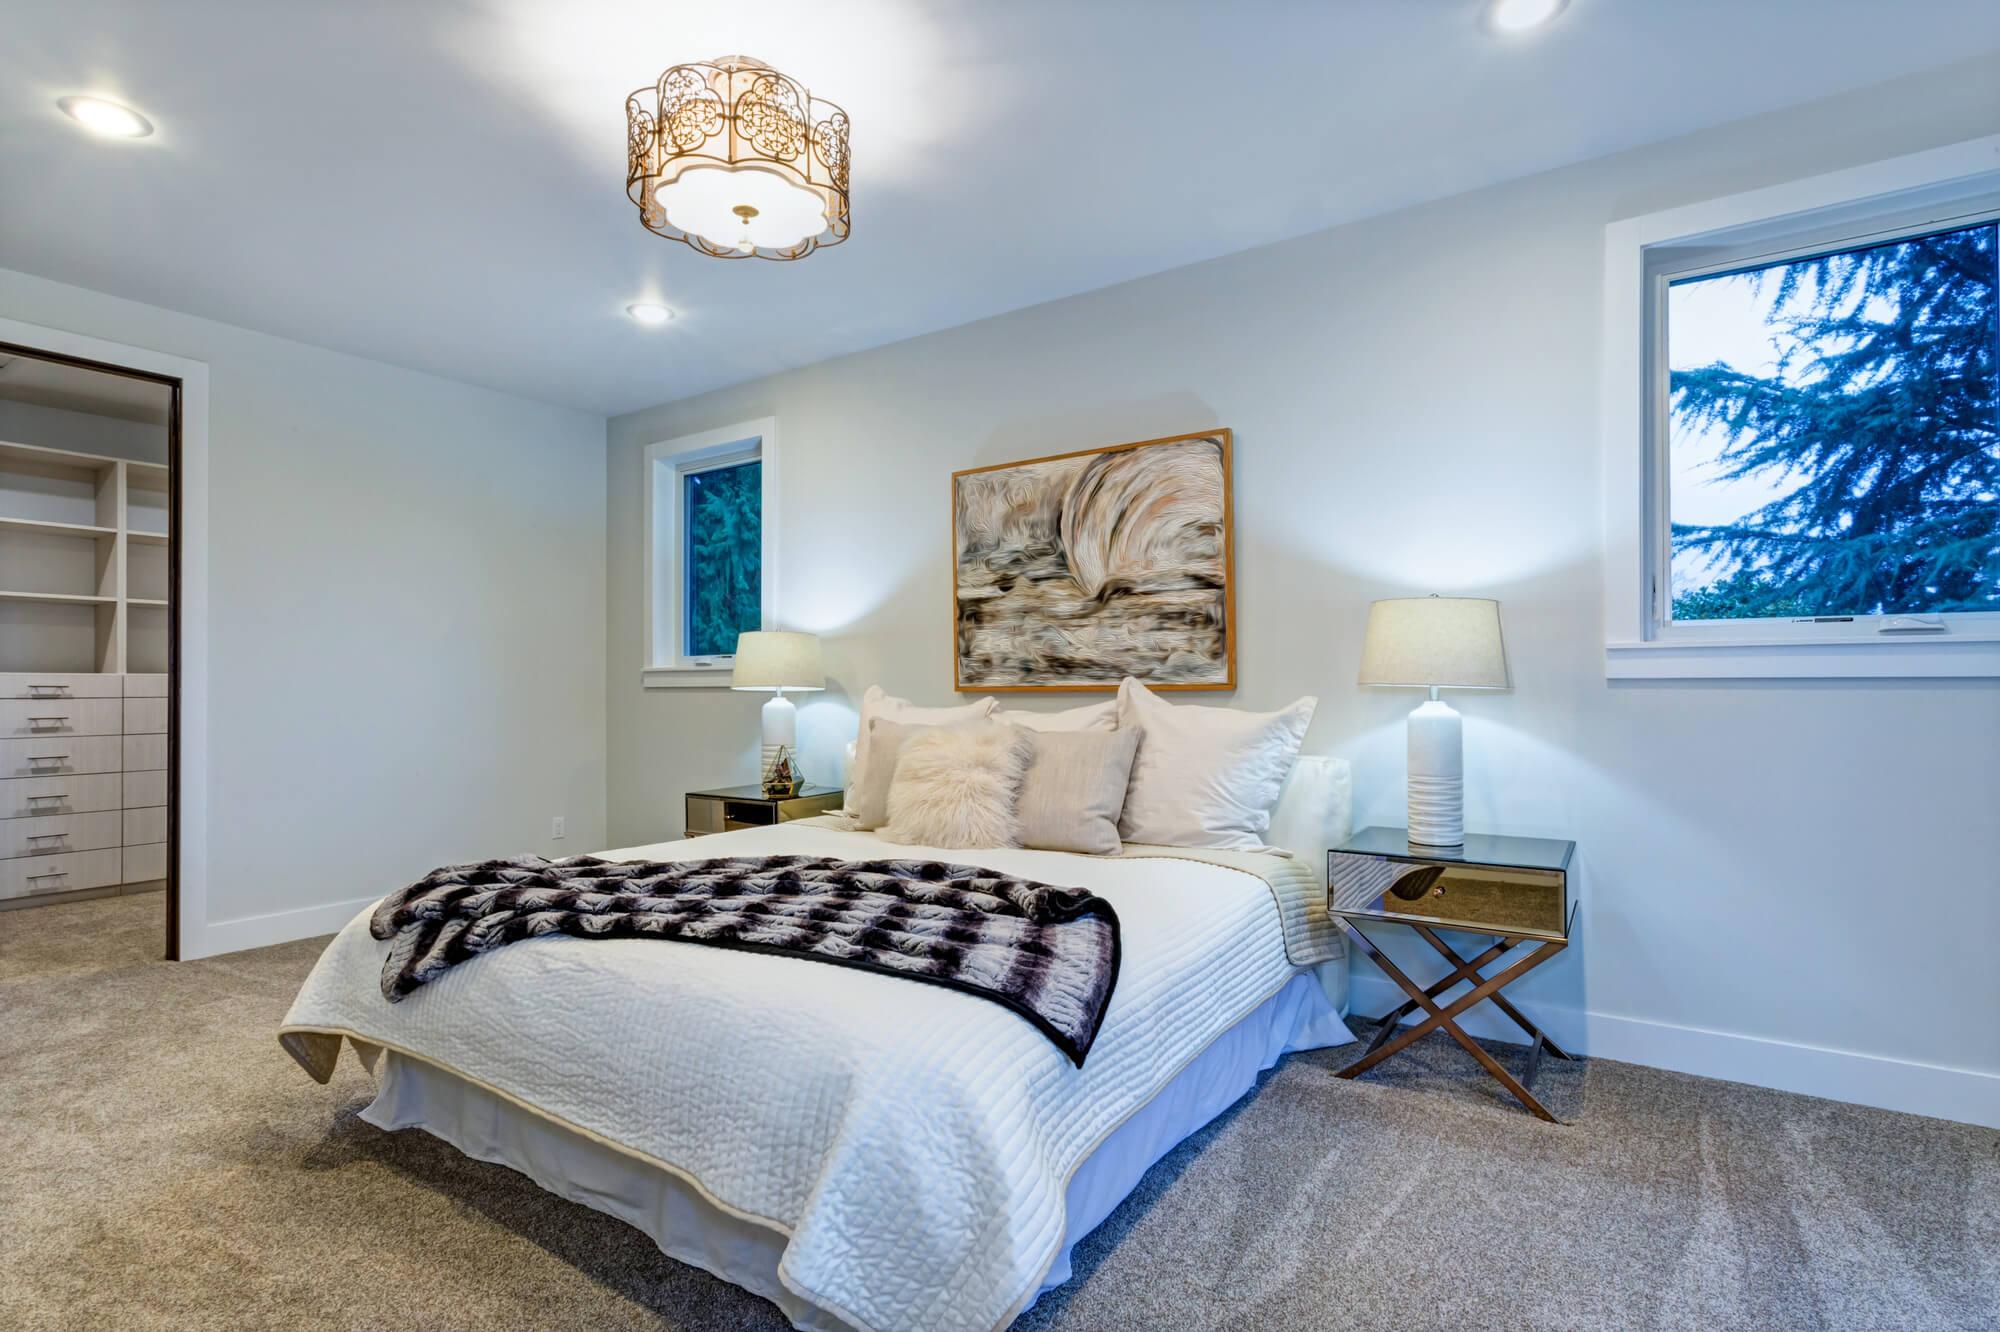 upgrade your bedding, interior design